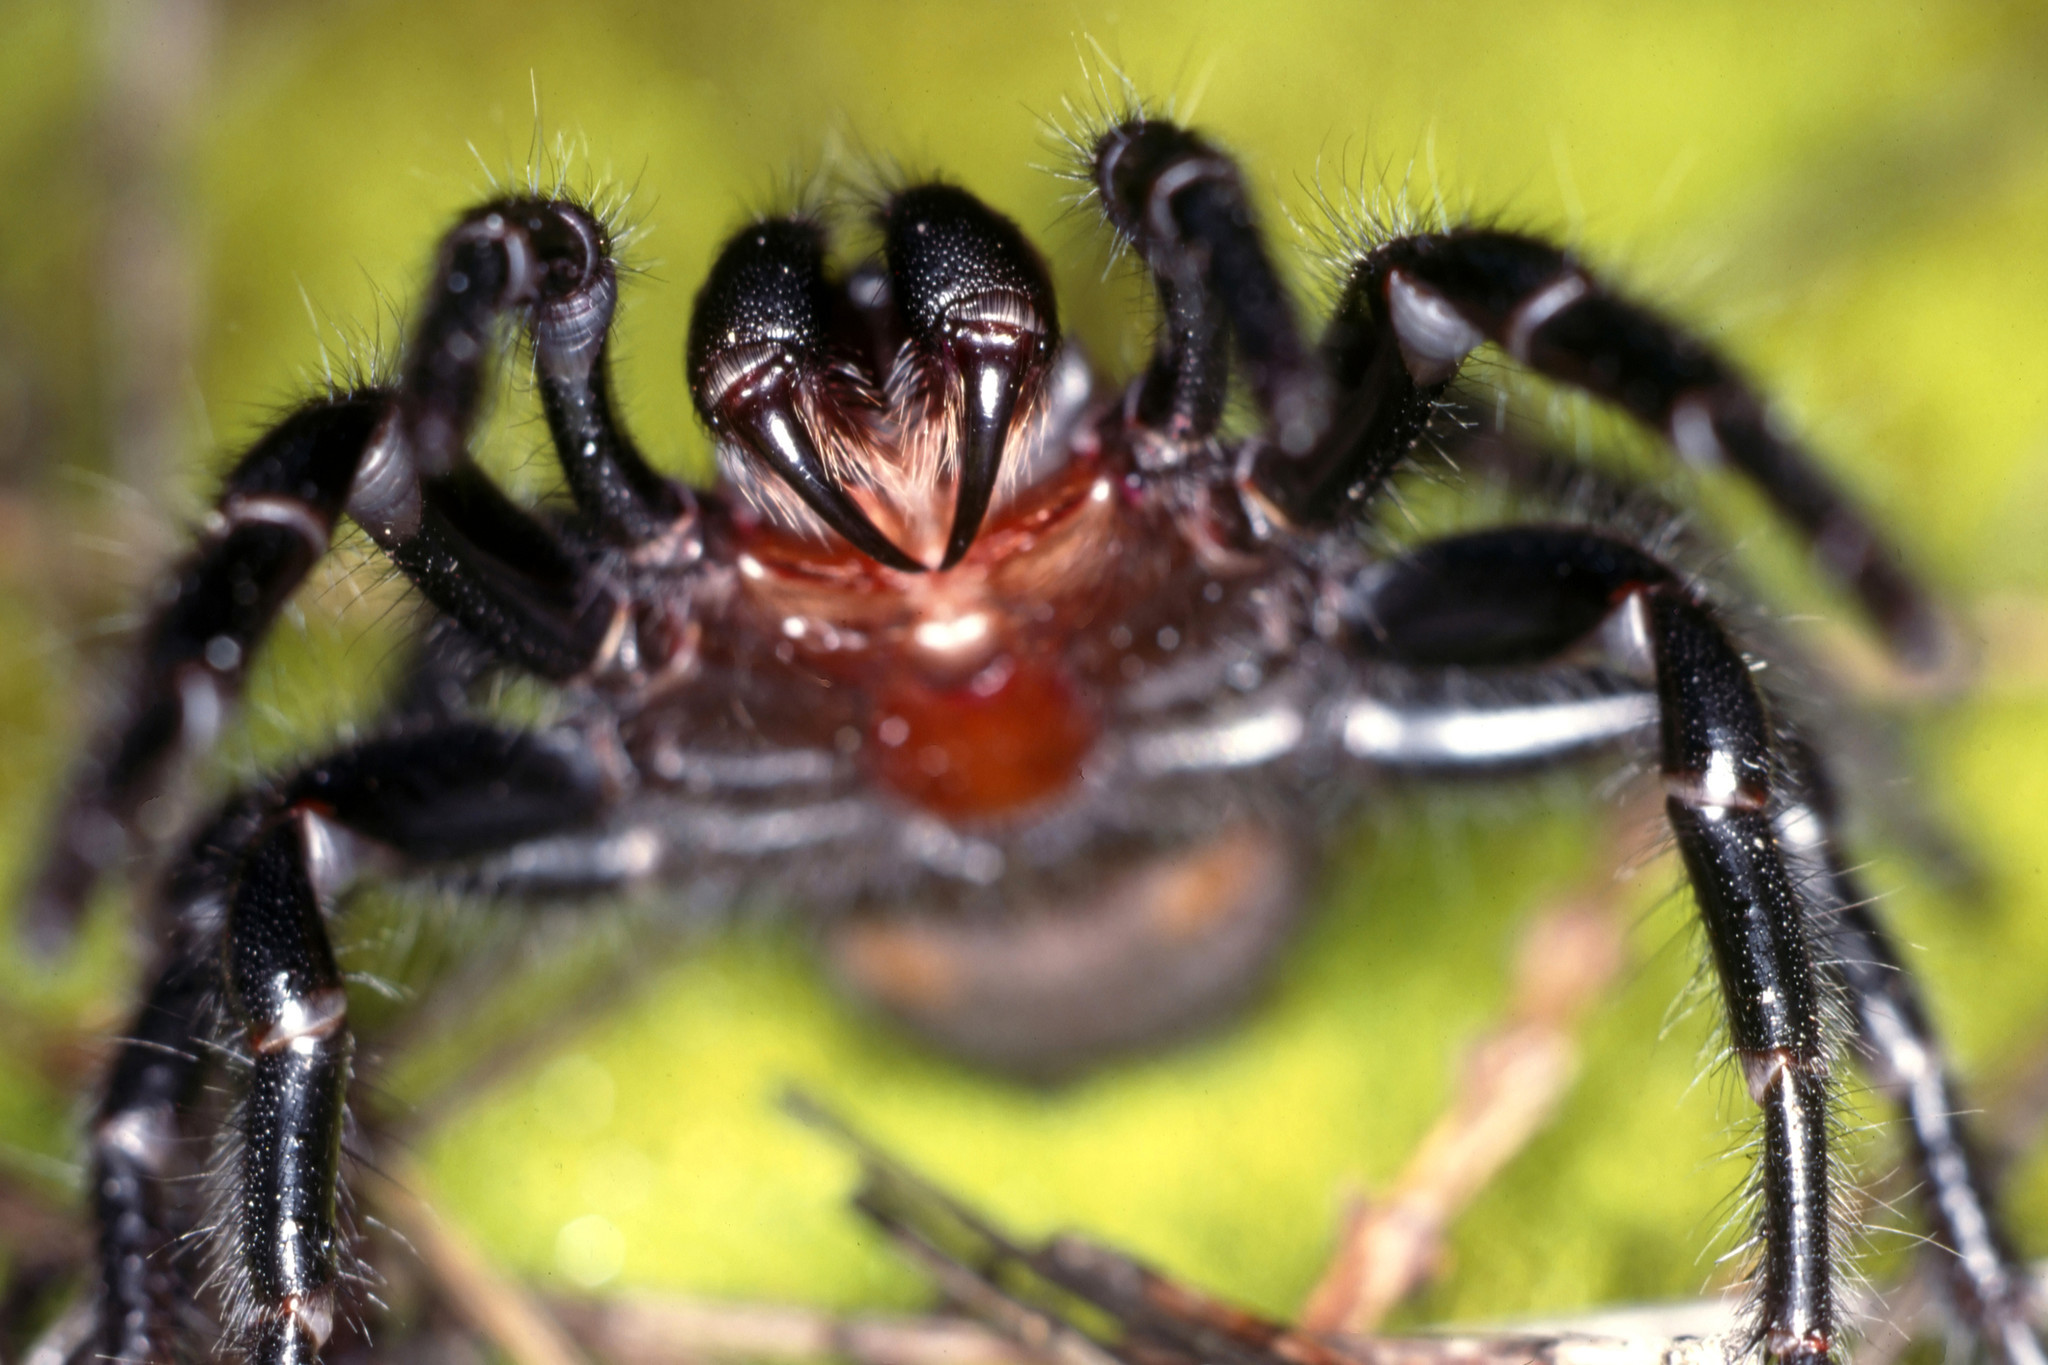 Venomous 'spider showers' are Australia's latest concern